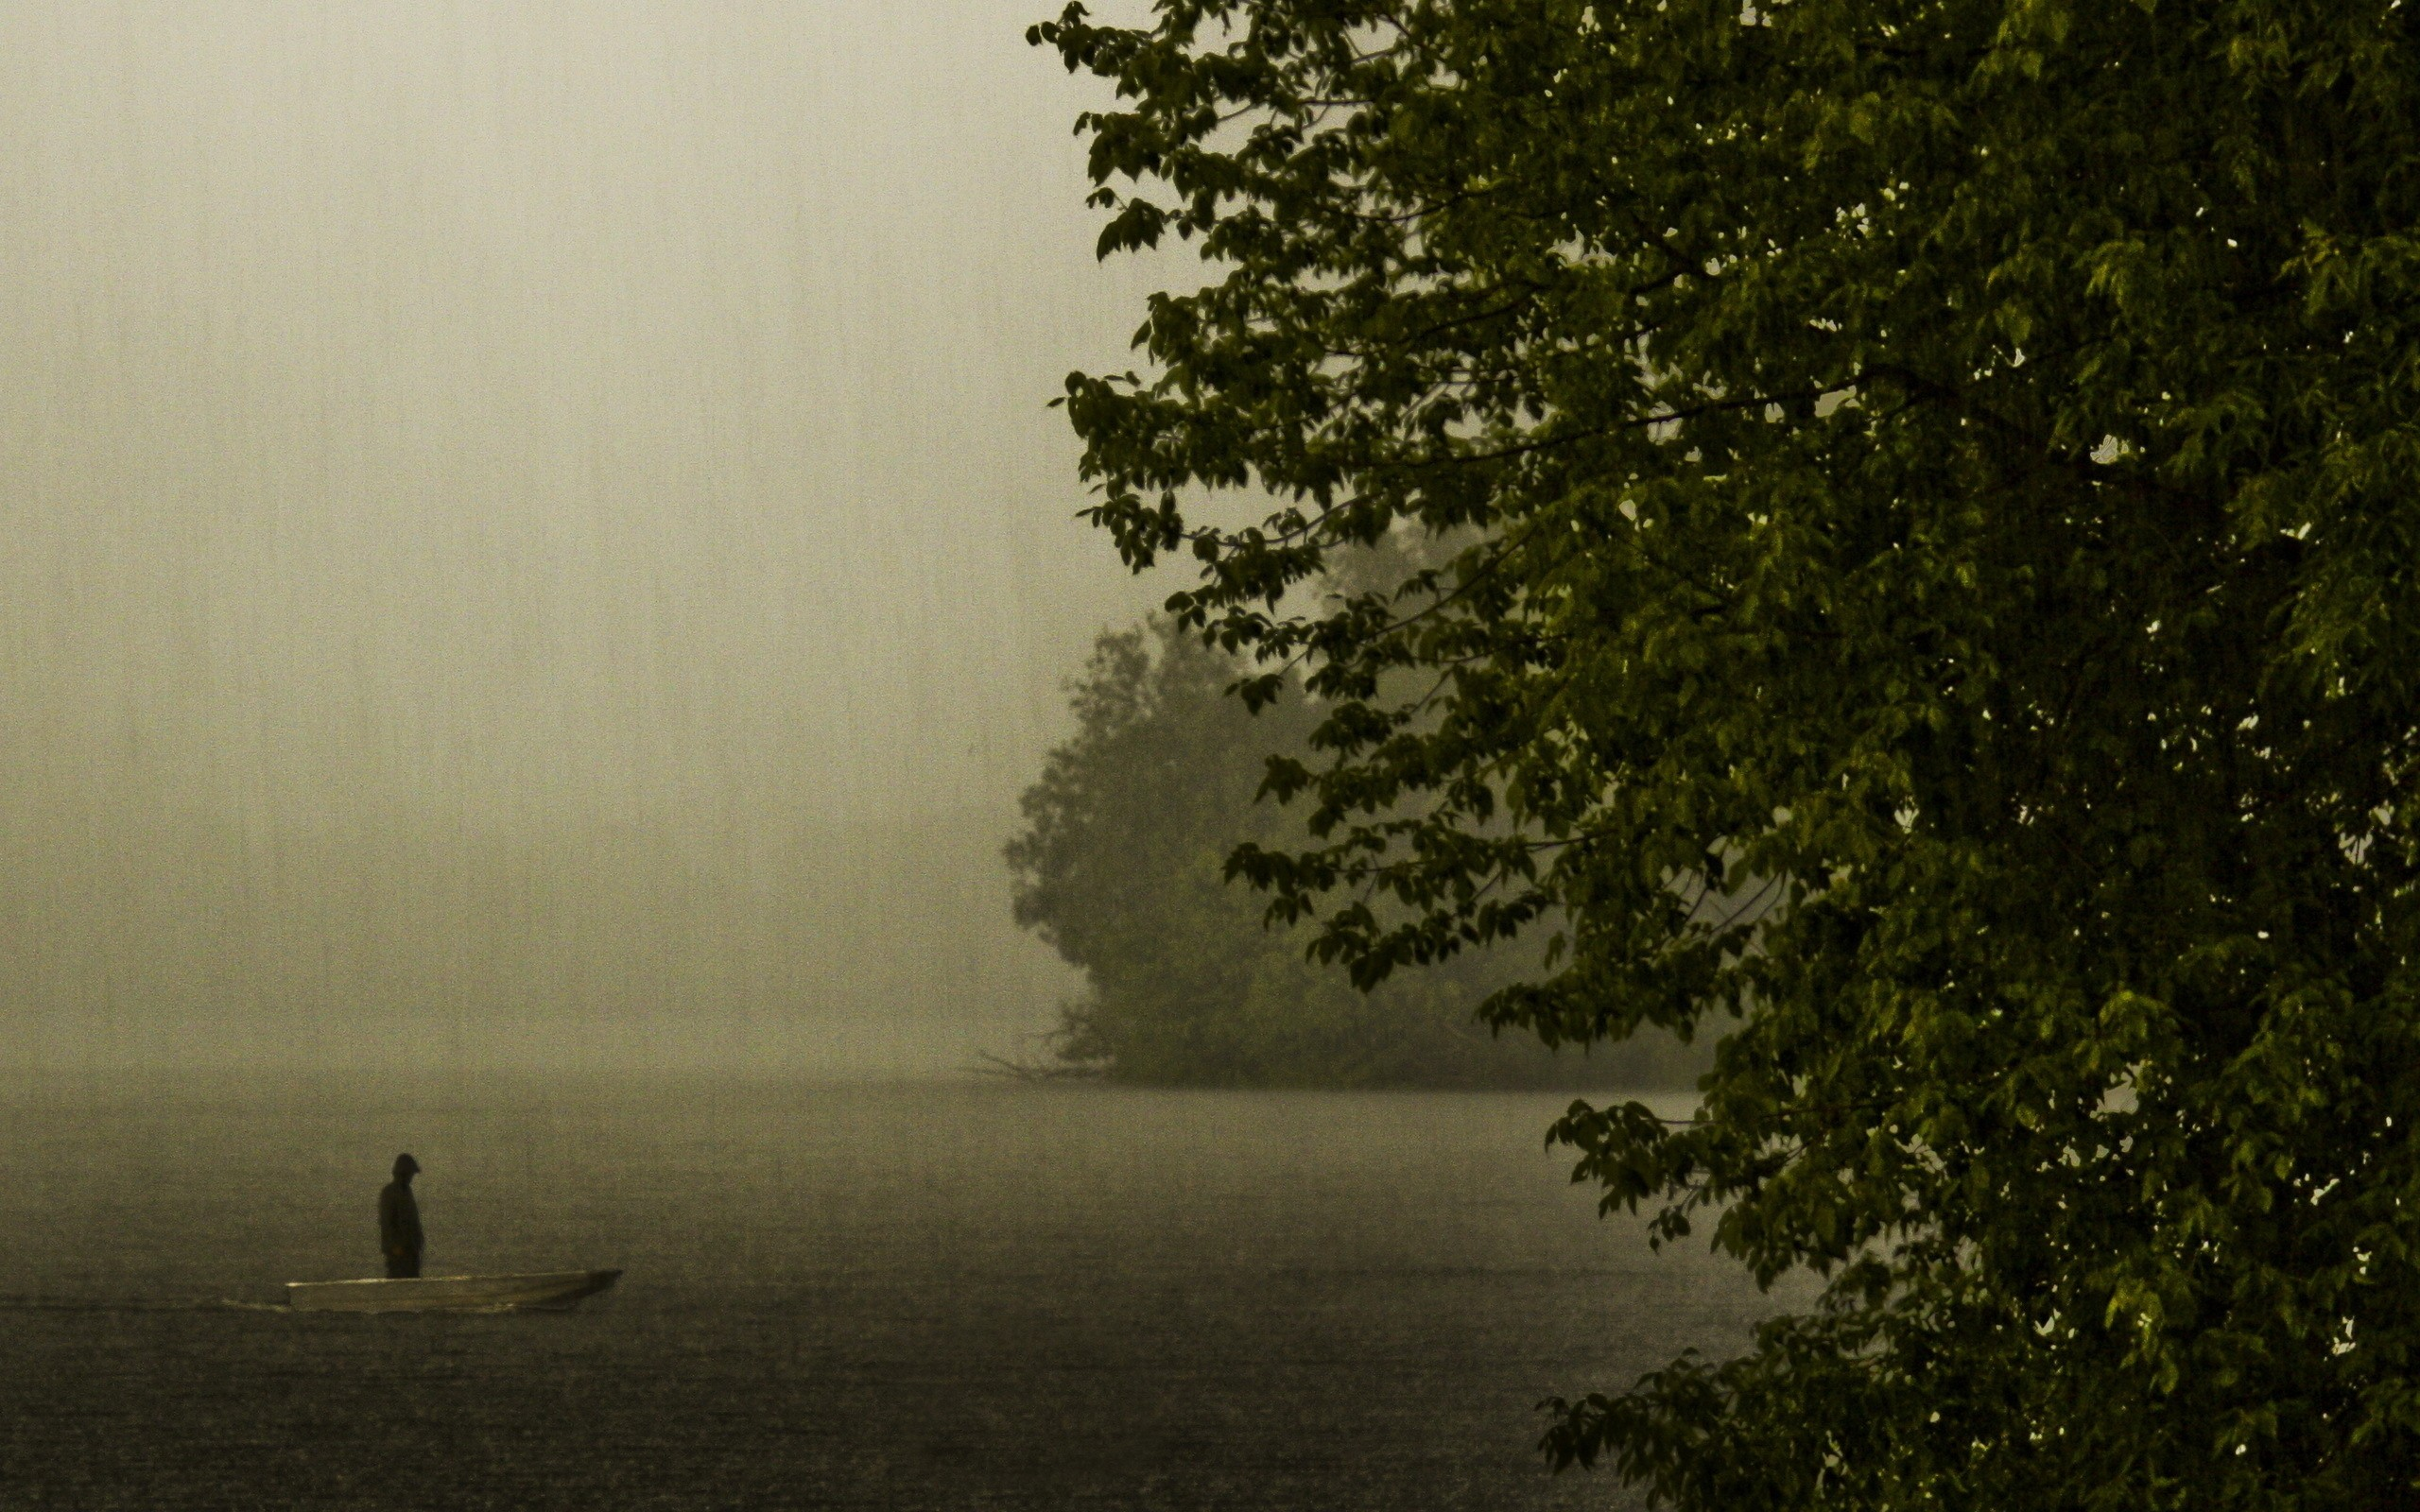 Rainy Day on the Lake wallpapers Rainy Day on the Lake stock photos 2560x1600